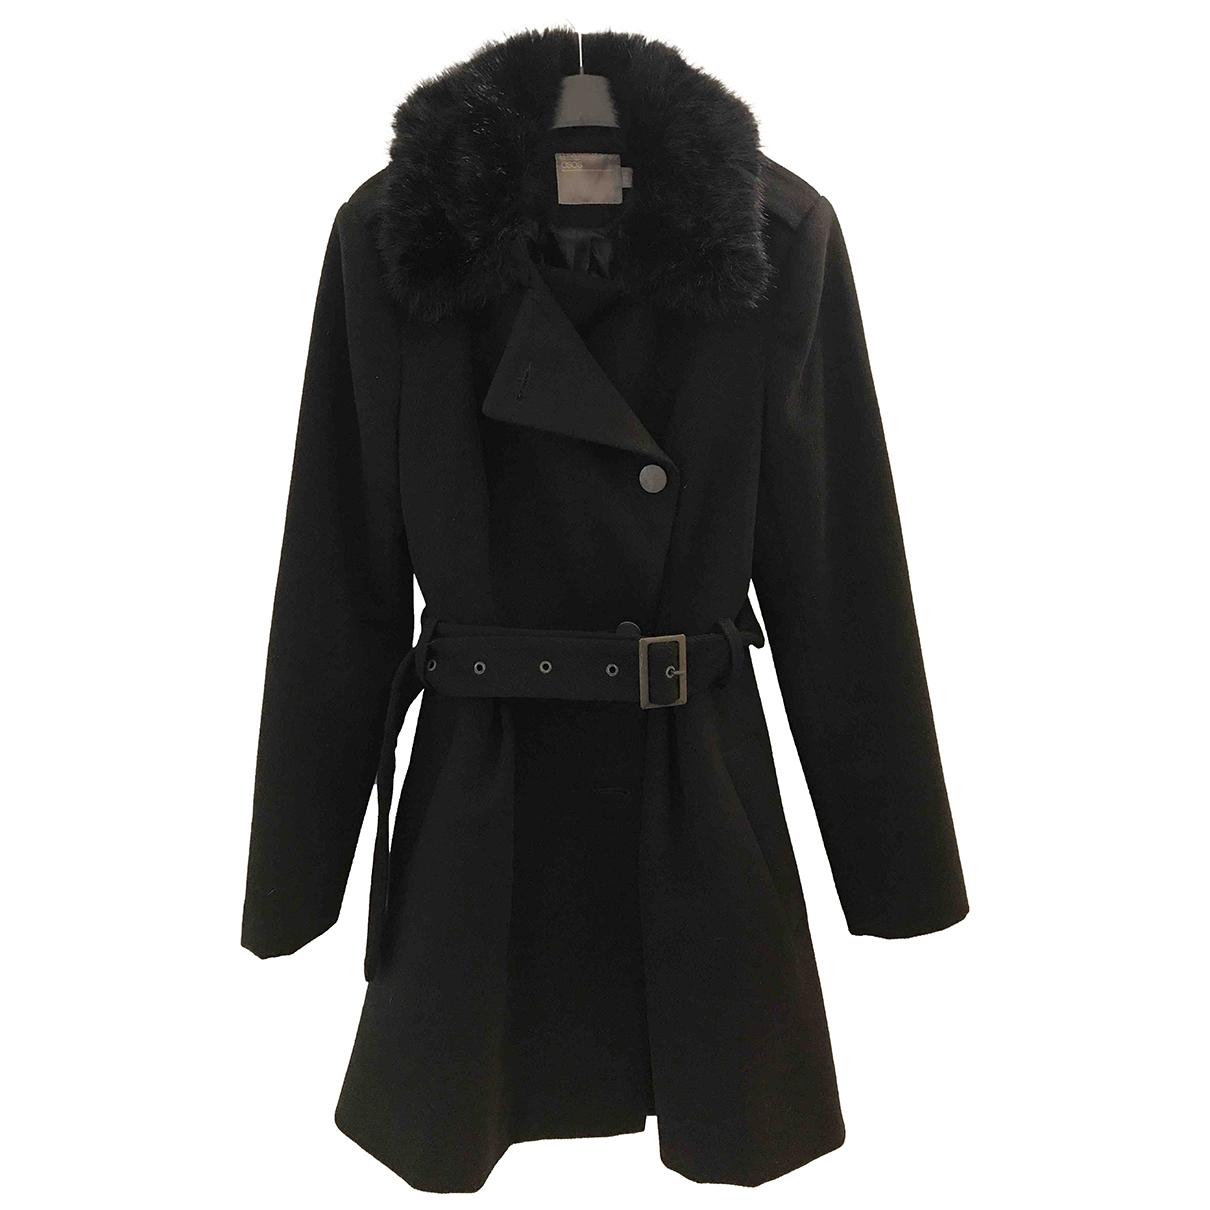 Asos \N Black Wool coat for Women 10 UK